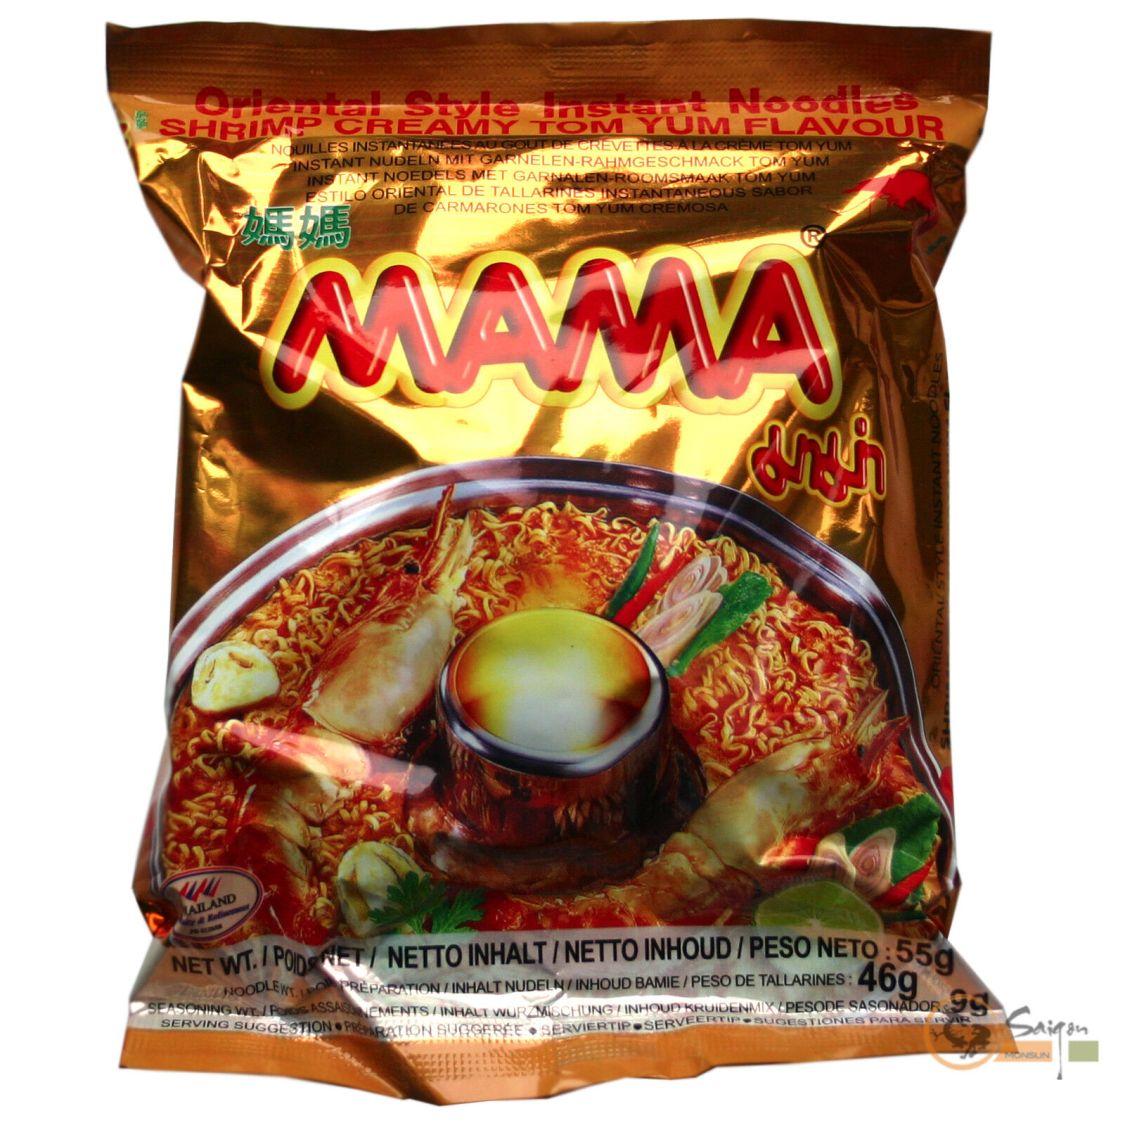 1Karton (30x55g) Mama Instantnudeln Tom Yum Shrimps Creamy Istant Nudelsuppe